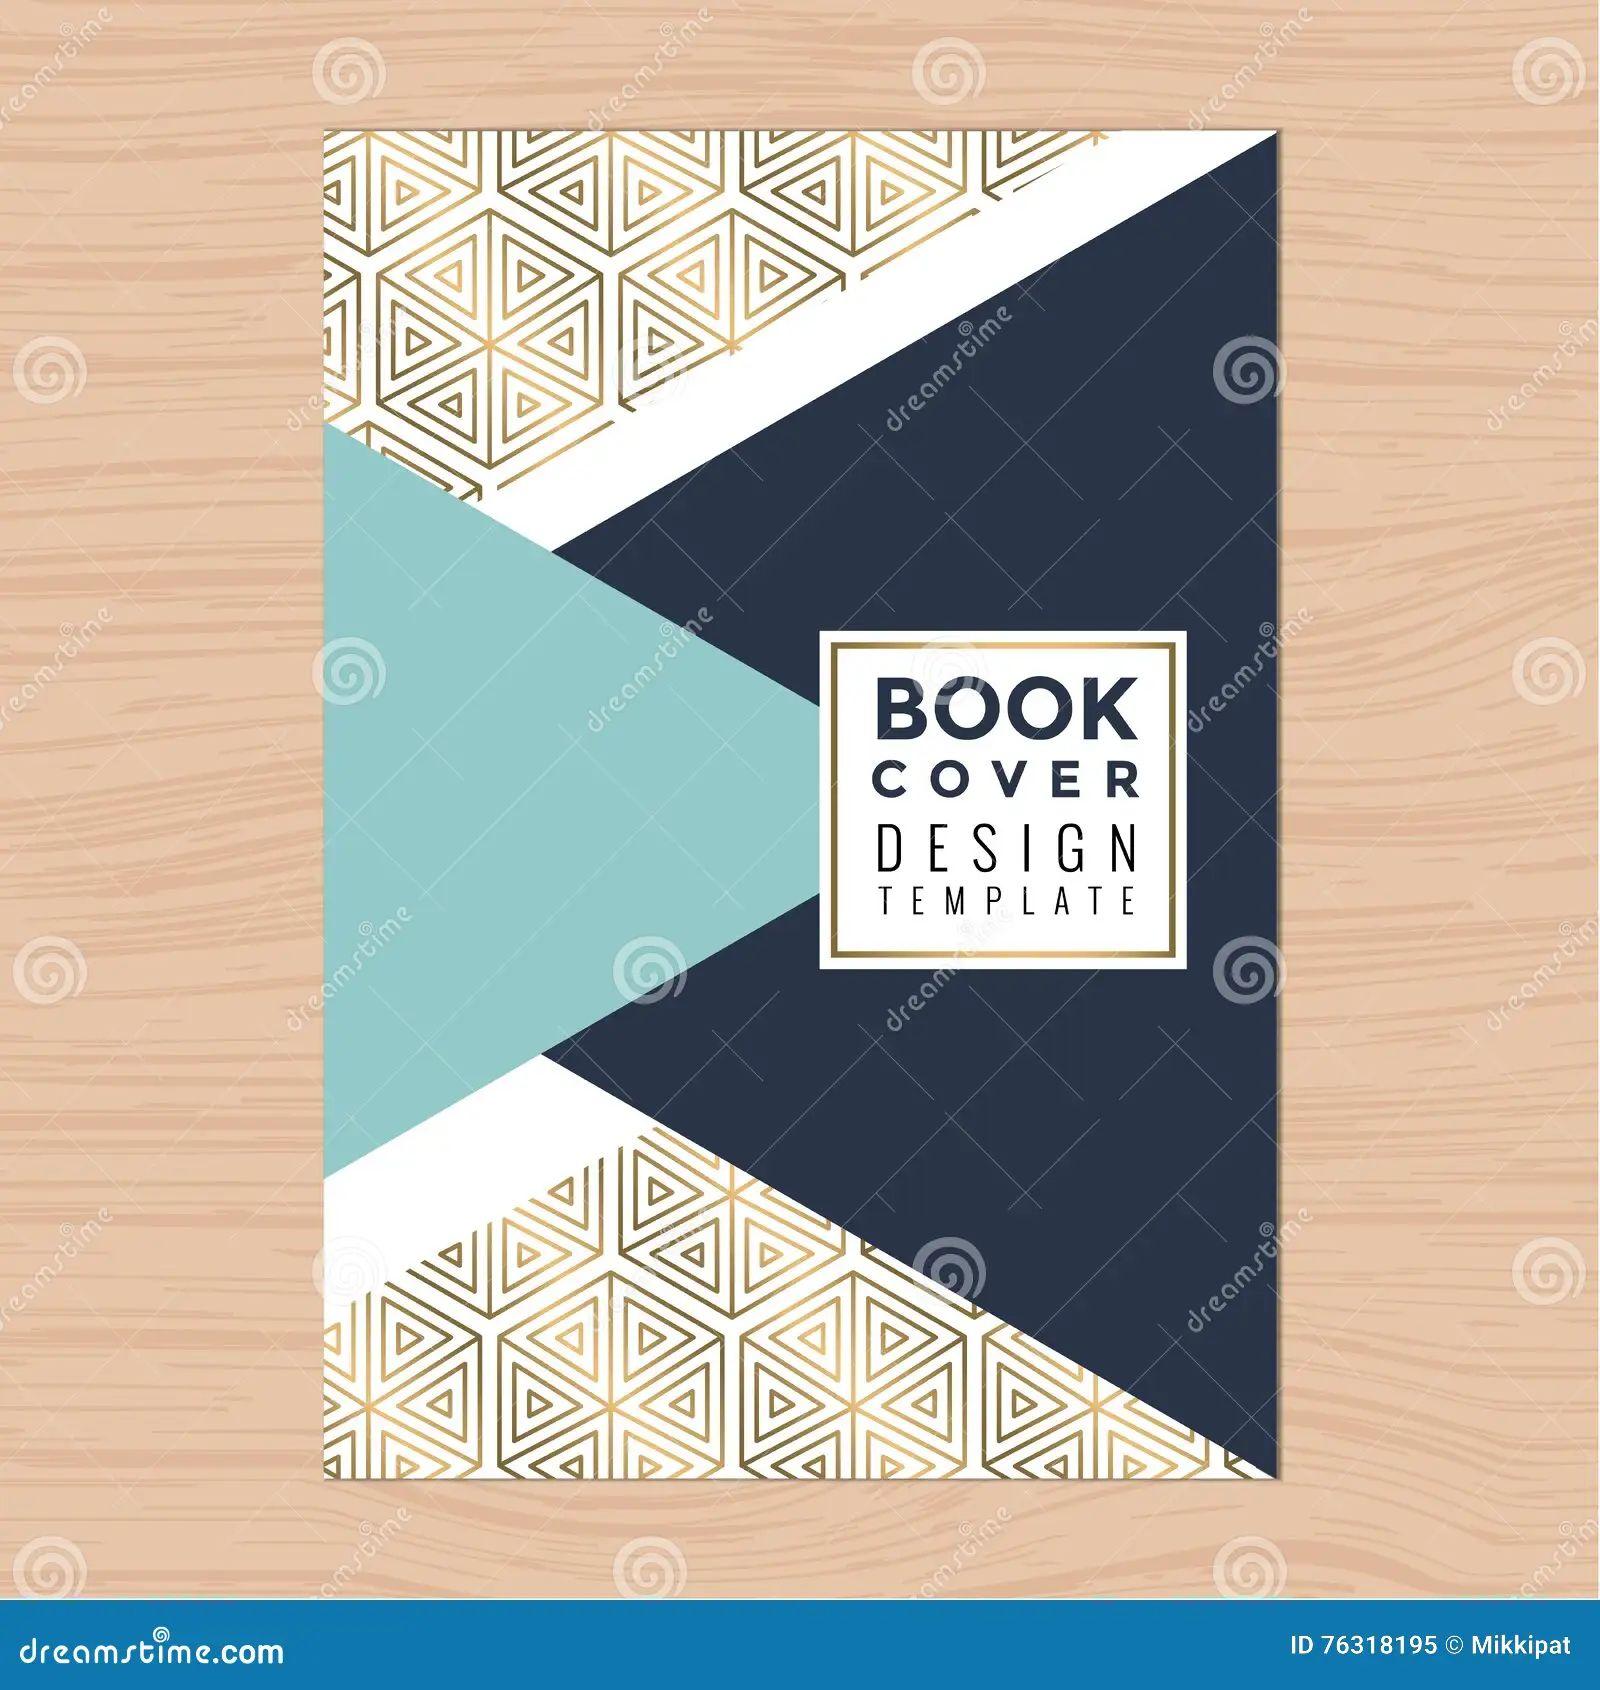 Poster design book - Download